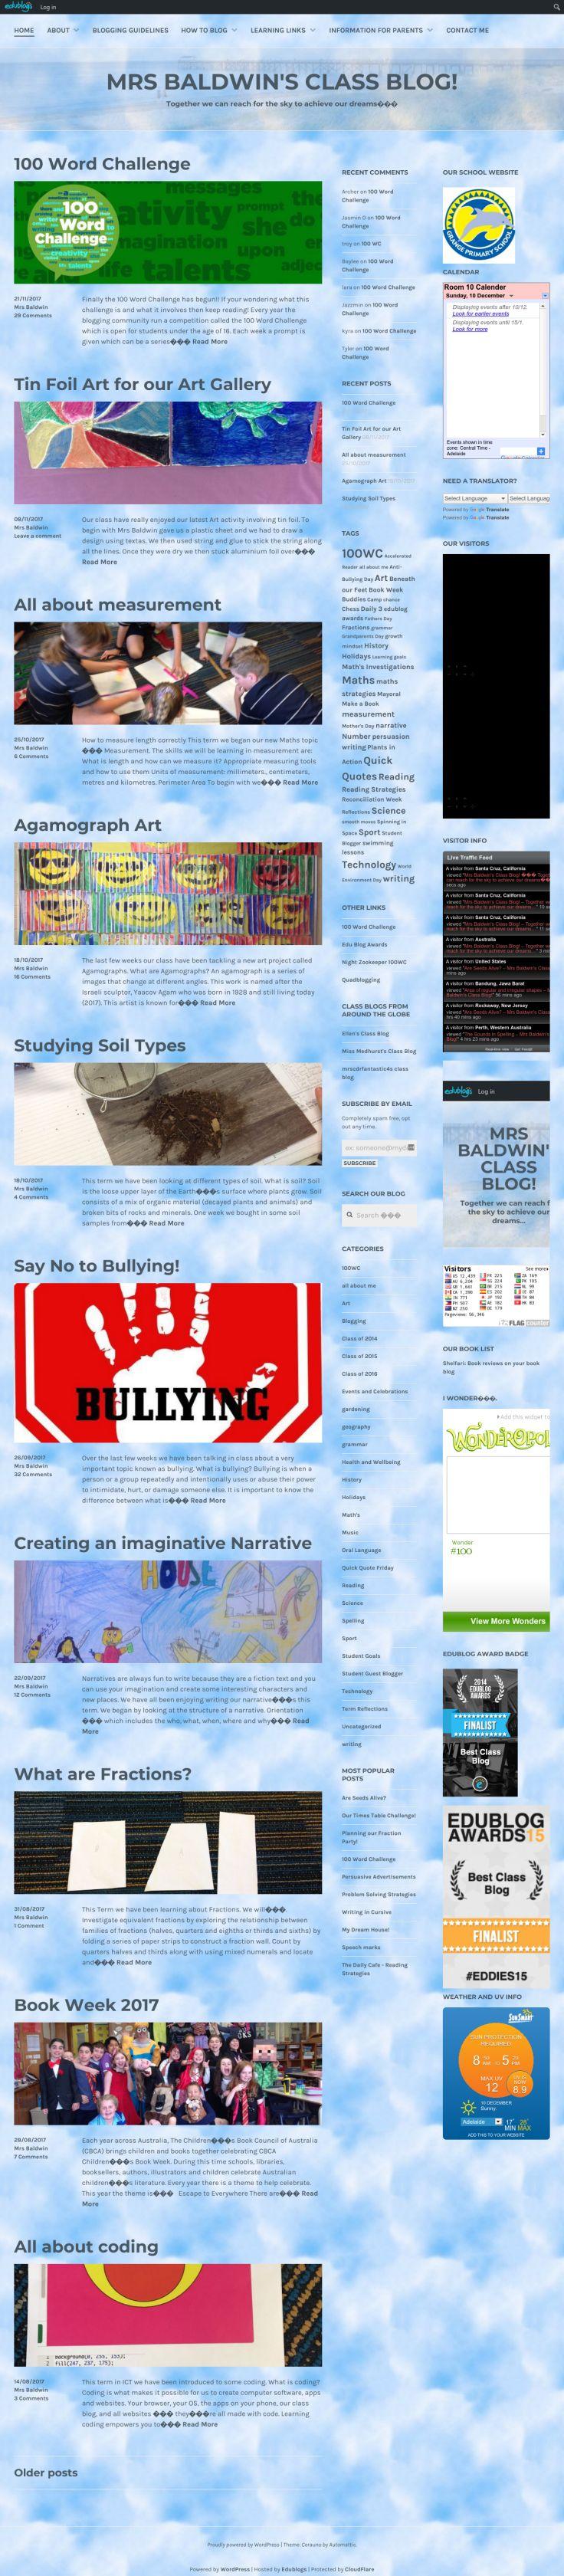 Mrs Baldwin's Class Blog | Grade 4 class blog in Australia | Edublogs